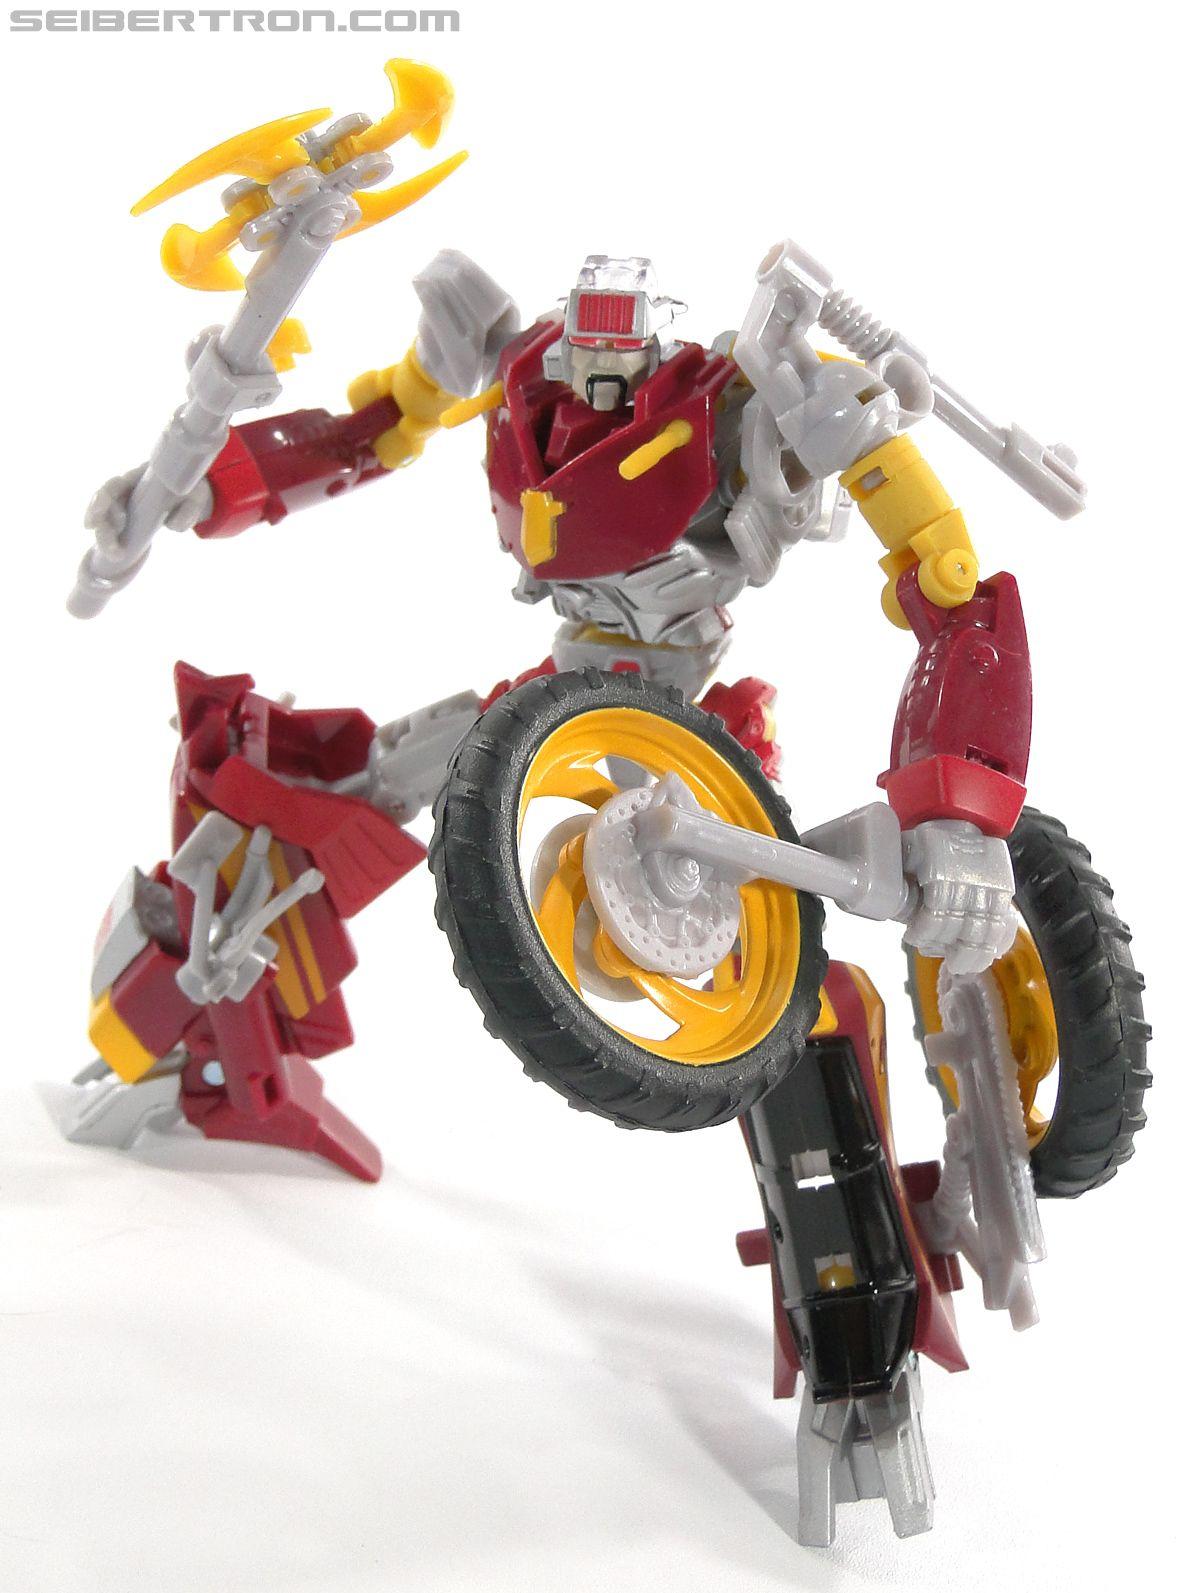 Lego Transformers Toys : Junkheap action figures toys pinterest